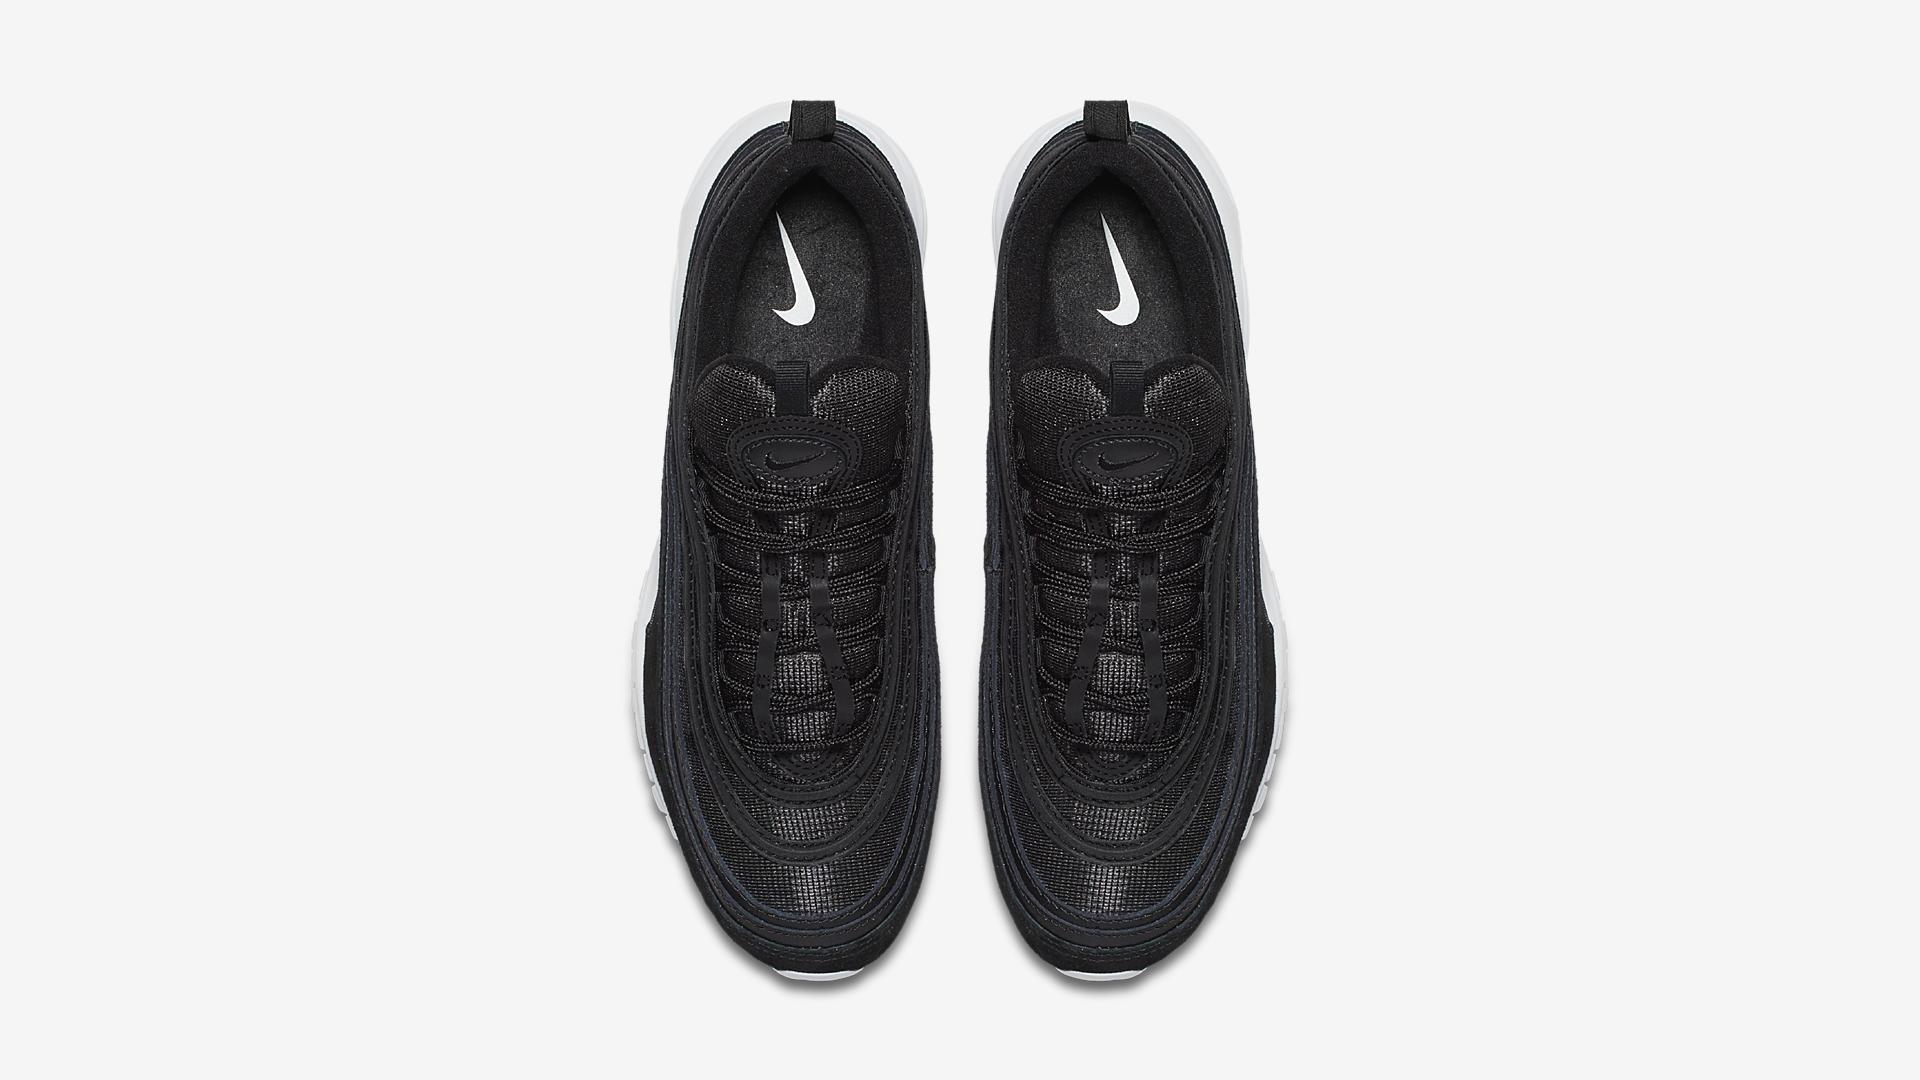 921826 003 Nike Air Max 97 Black 3